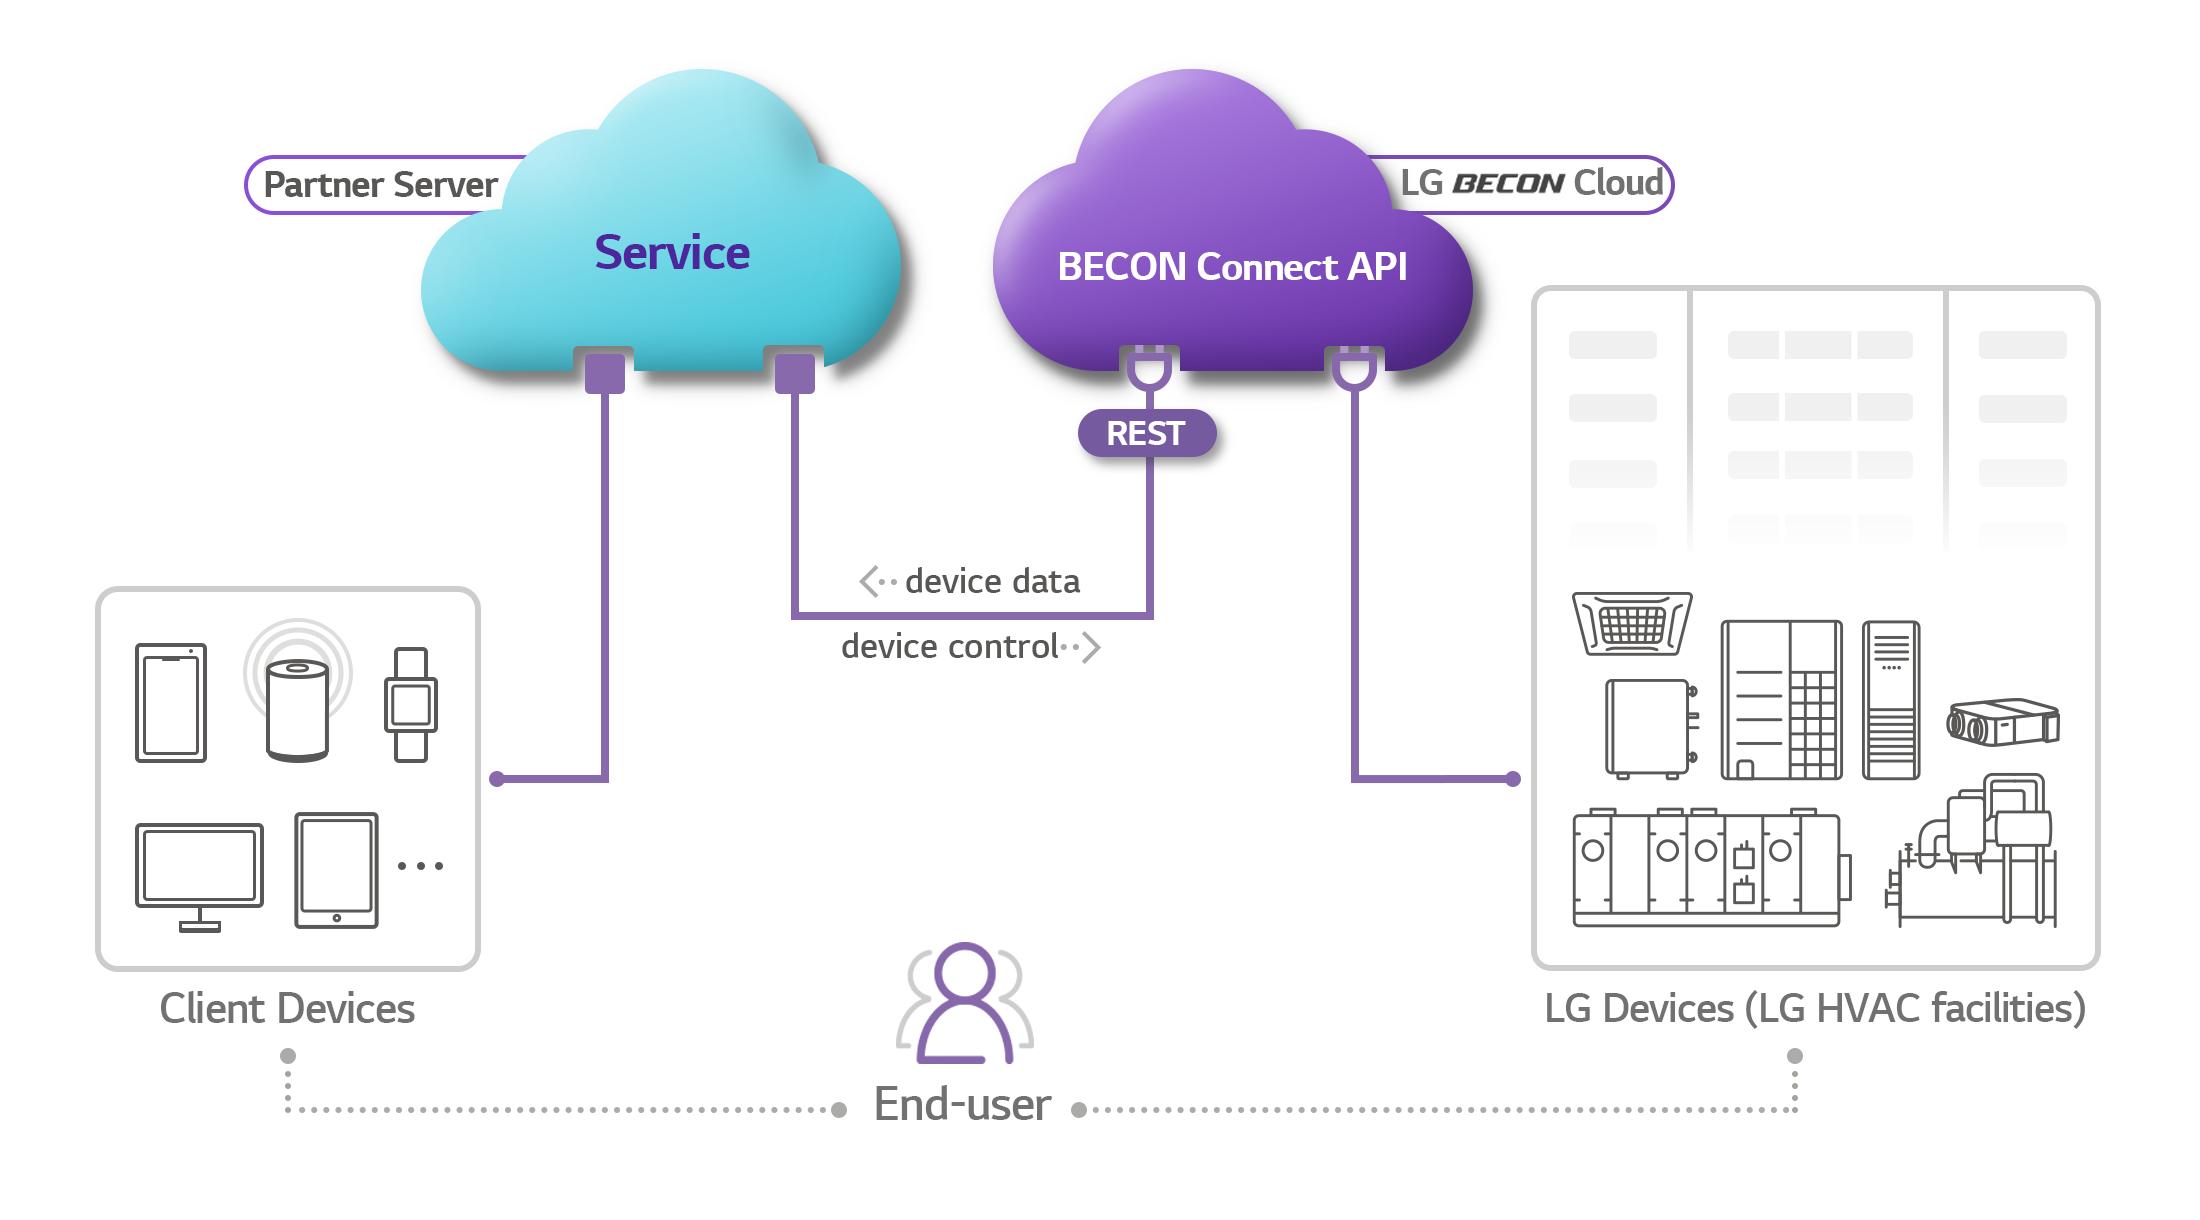 BECON Connect concept diagram